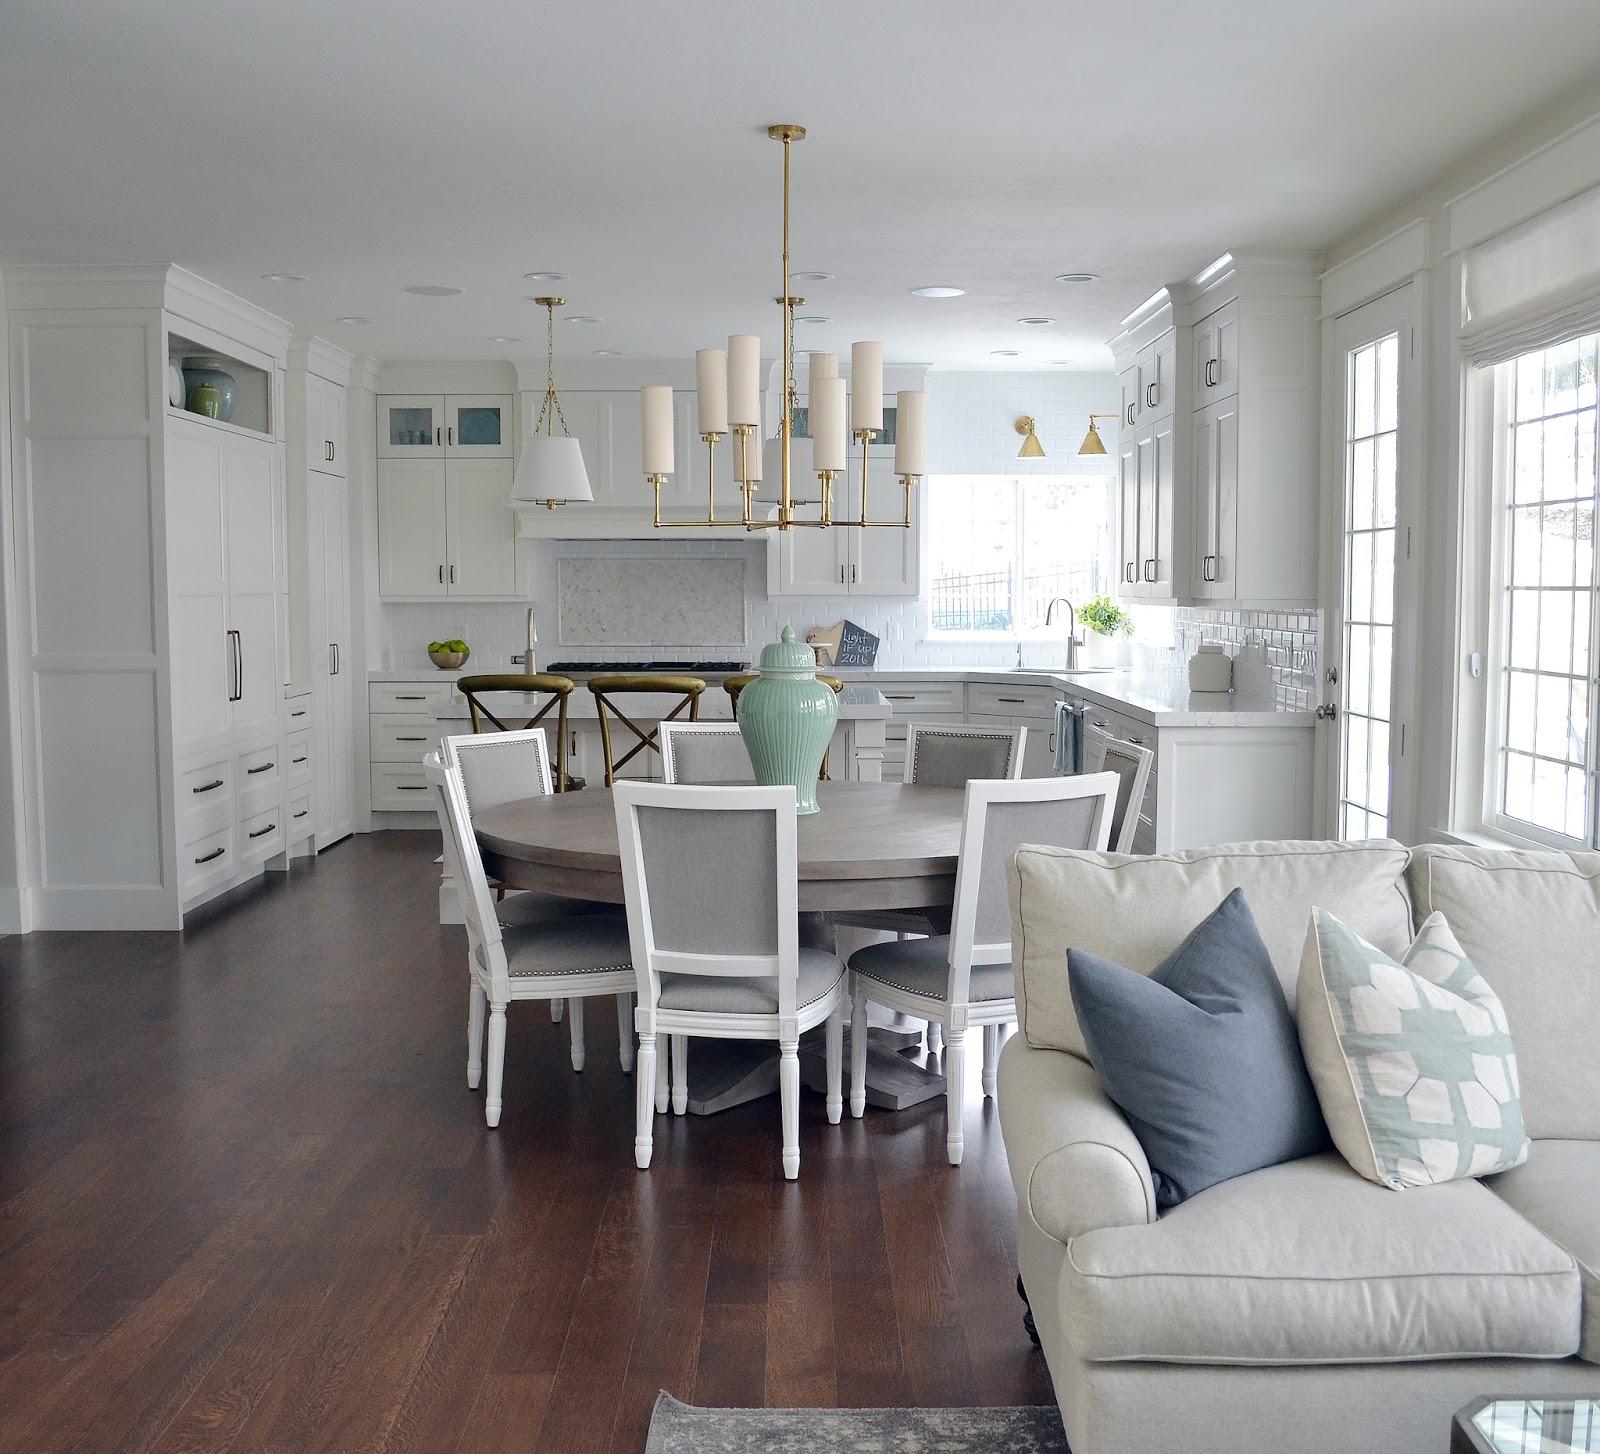 Sita Montgomery Interiors: The Primrose Project Kitchen